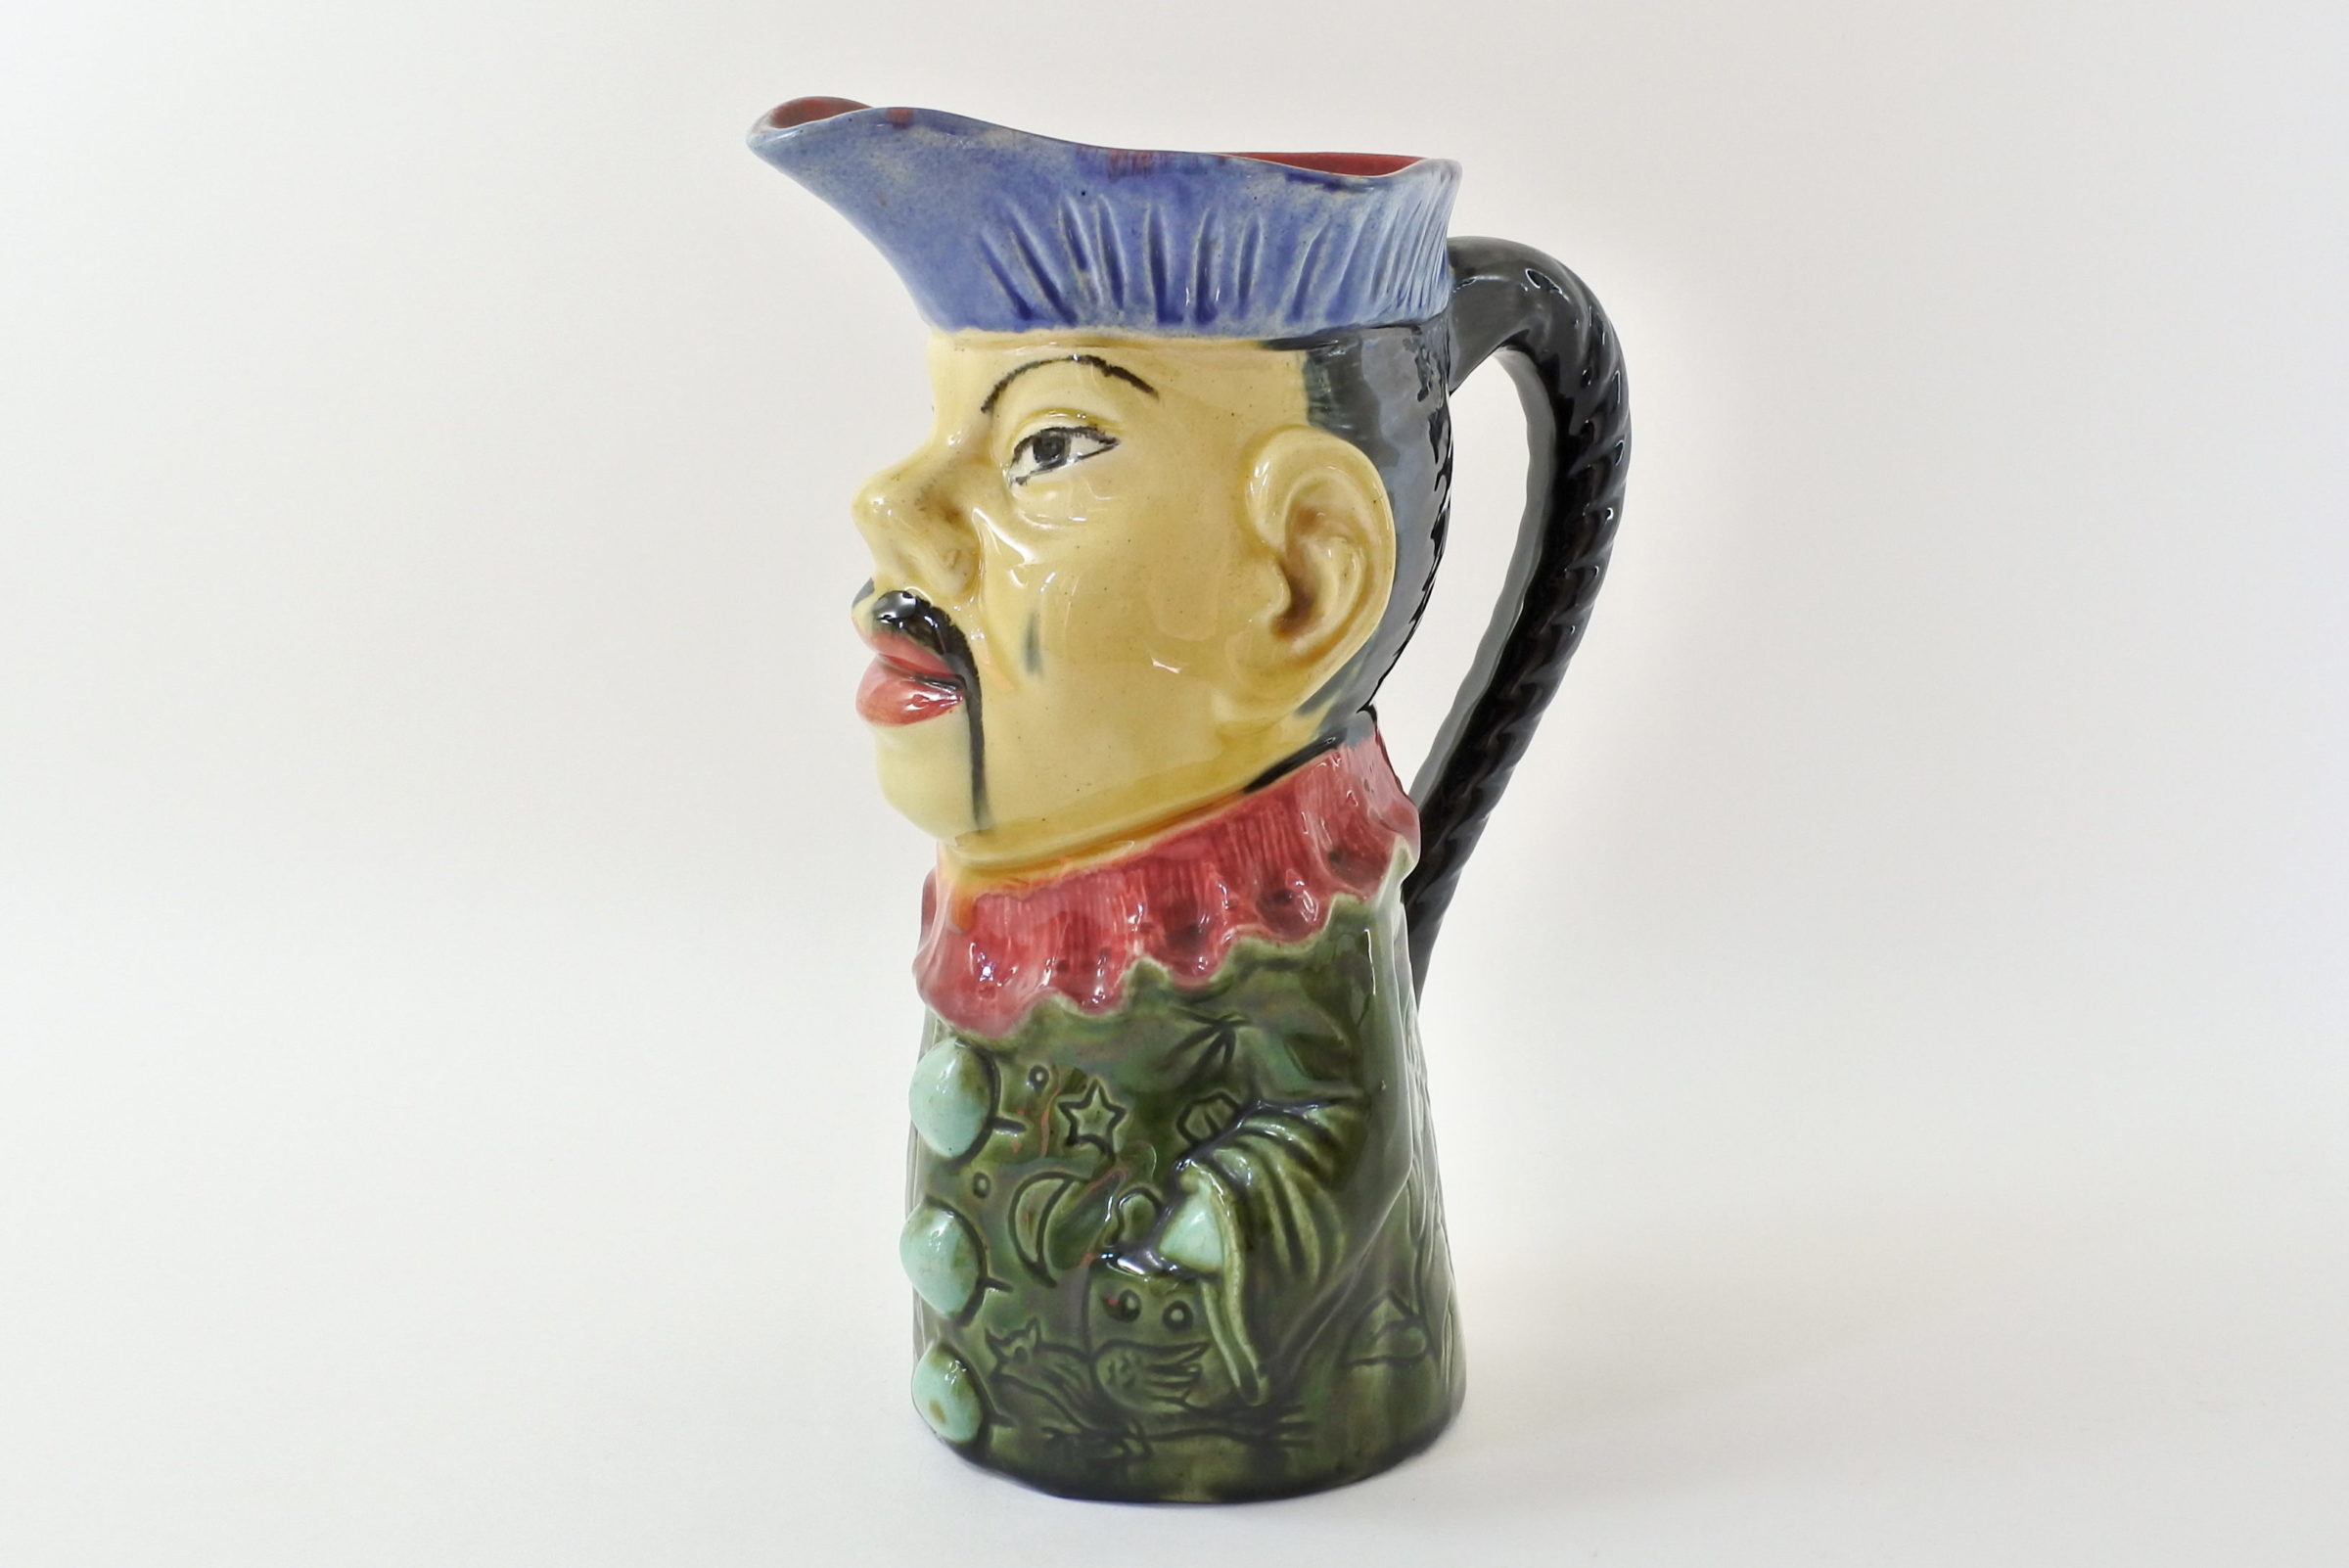 Brocca in ceramica barbotine a forma di cinese - Orchies